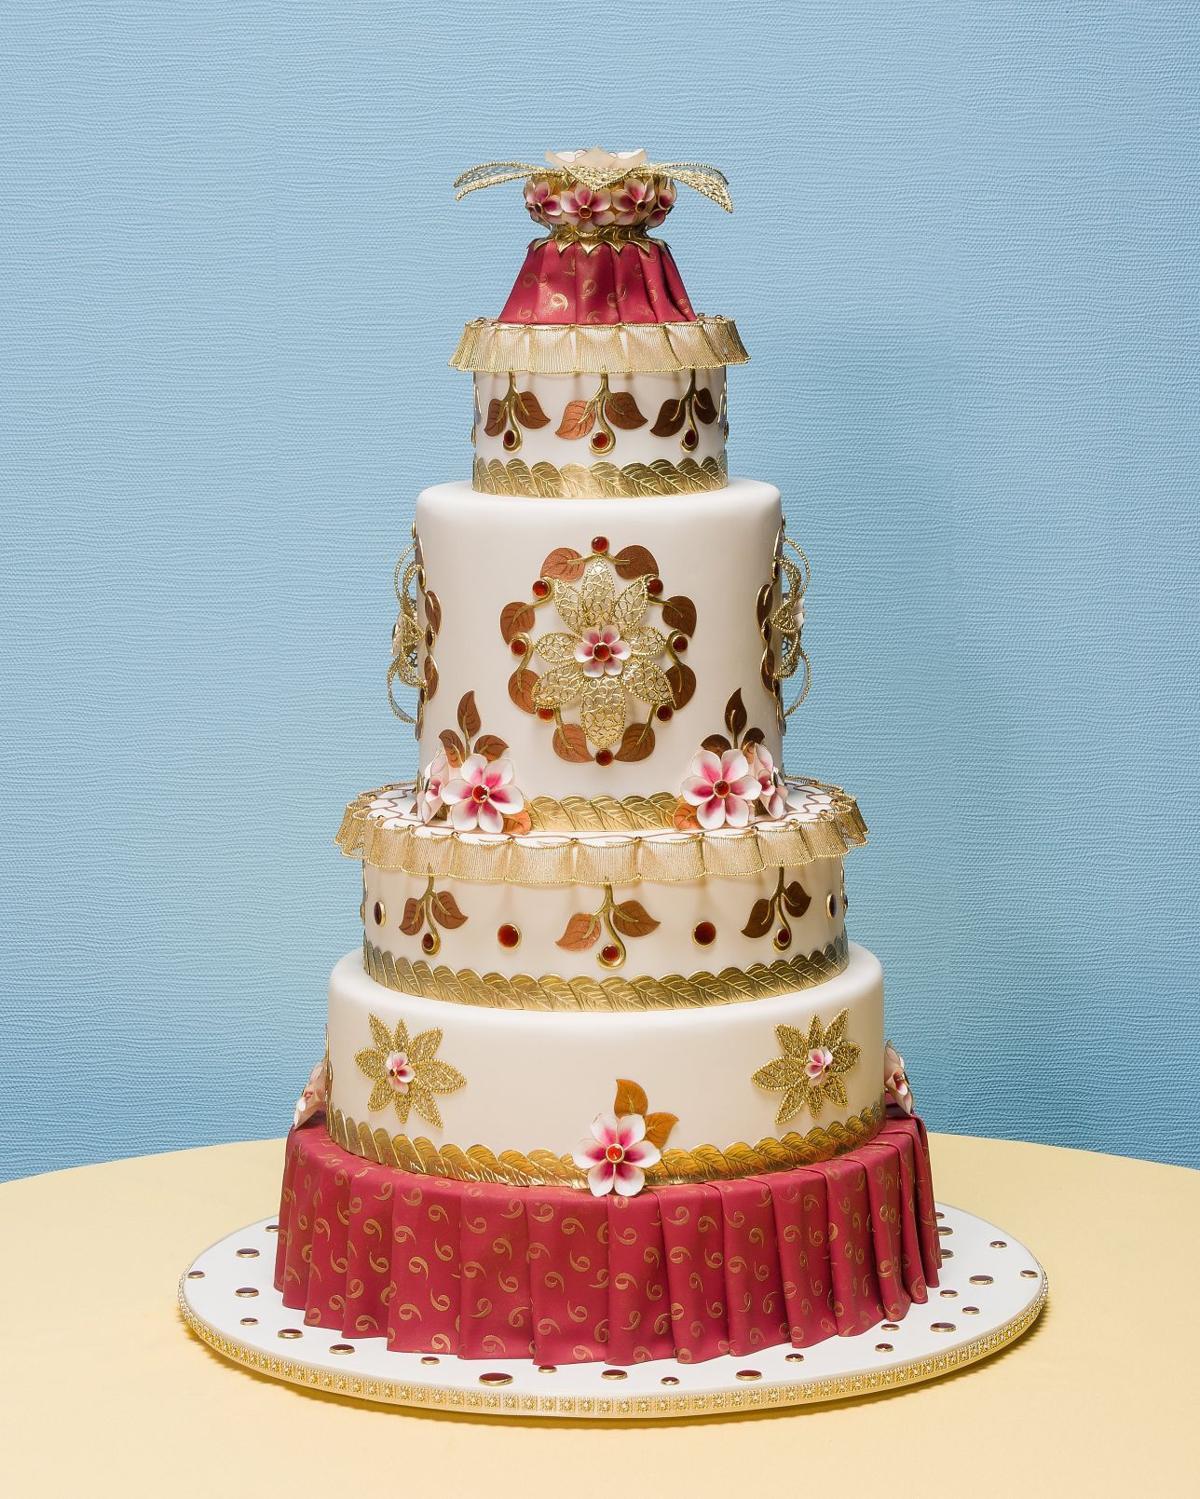 Wedding Dress Cake Earns Top Honors At Grand National